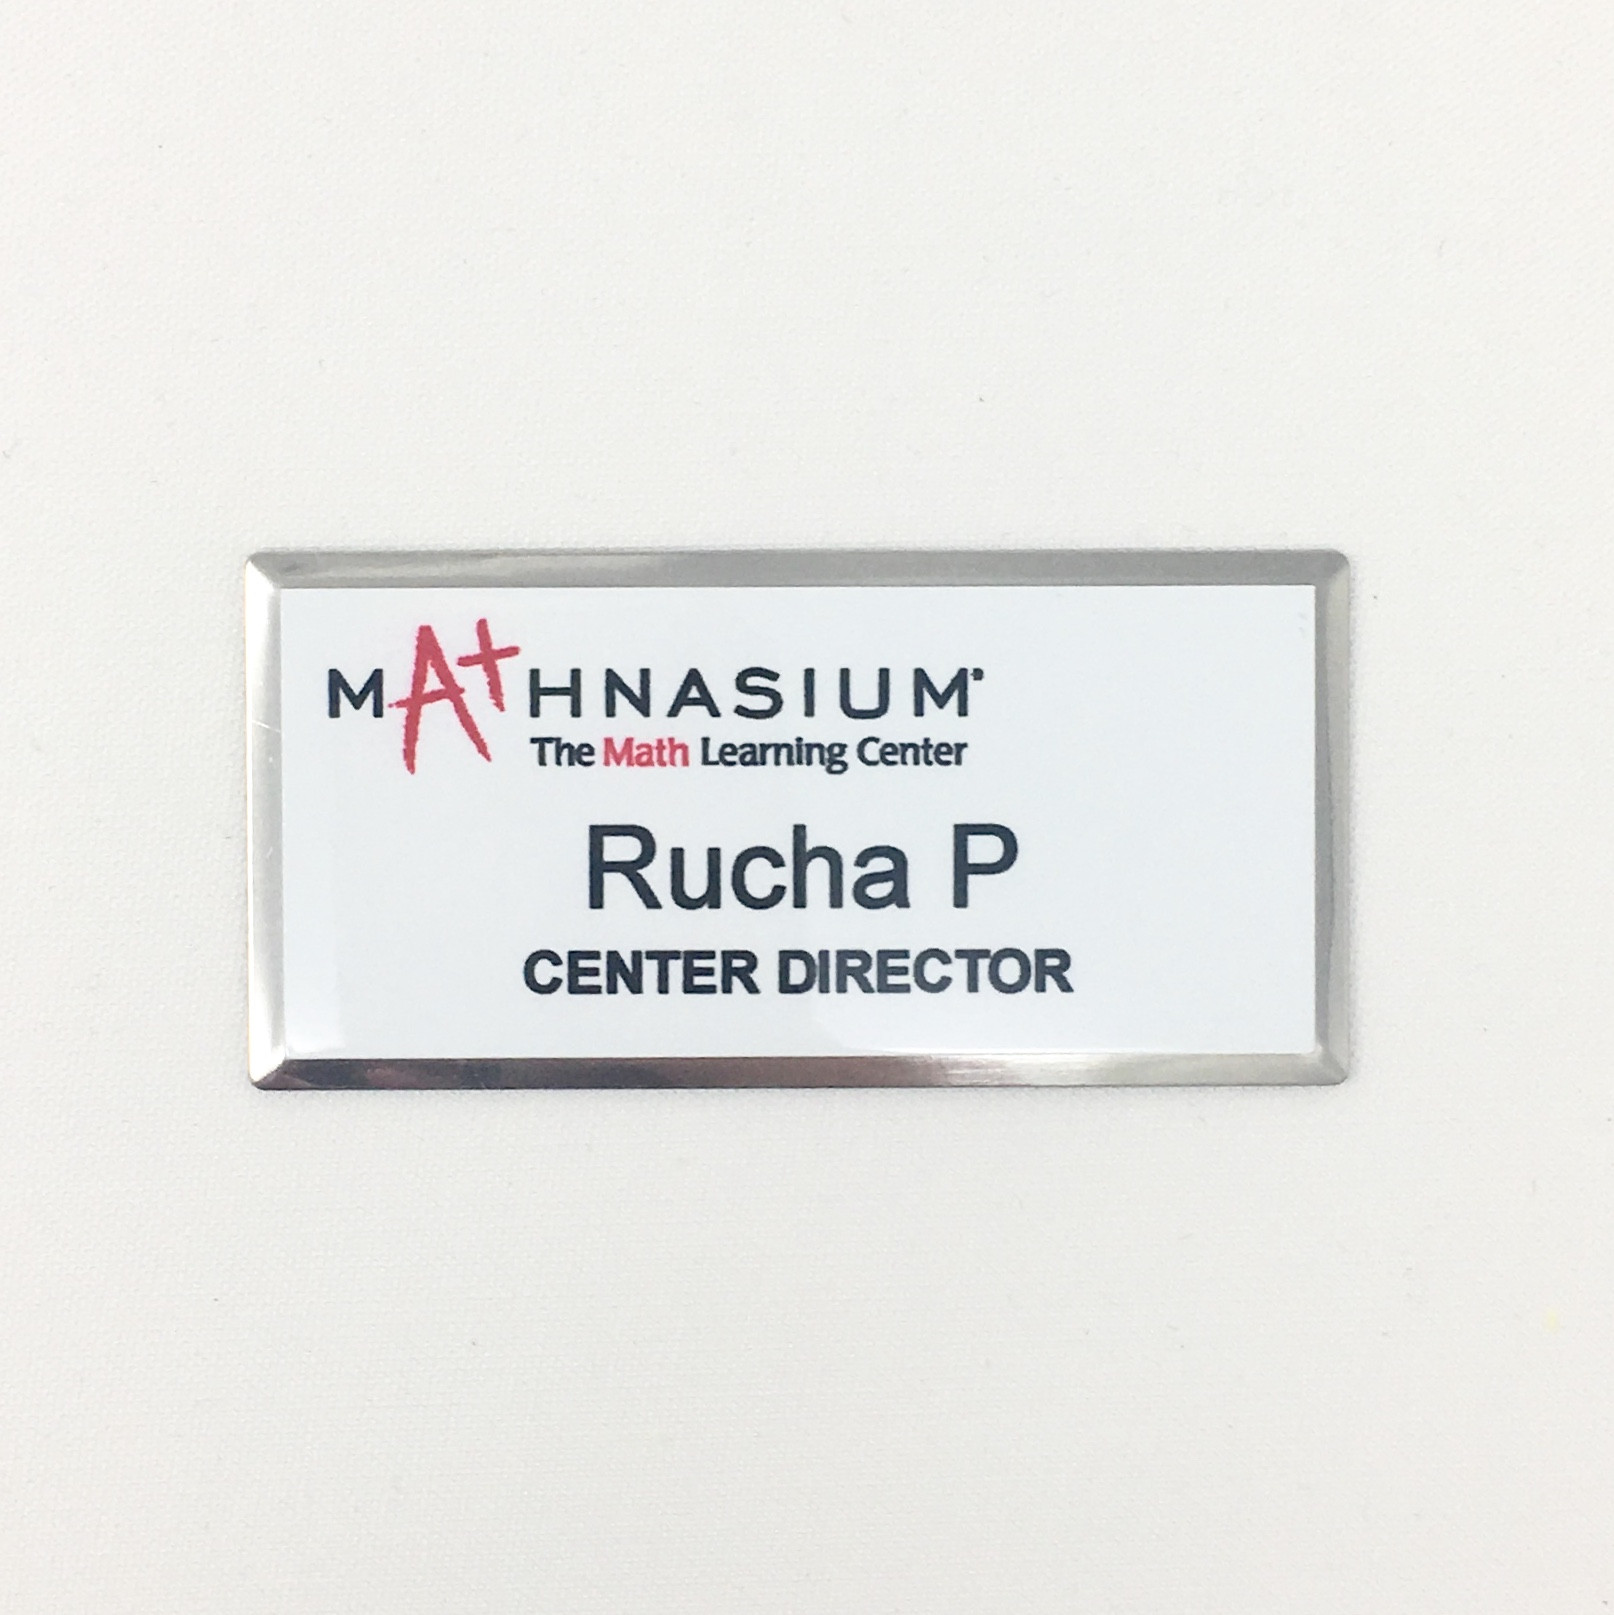 Mathnasium Silver Beveled Name Tag